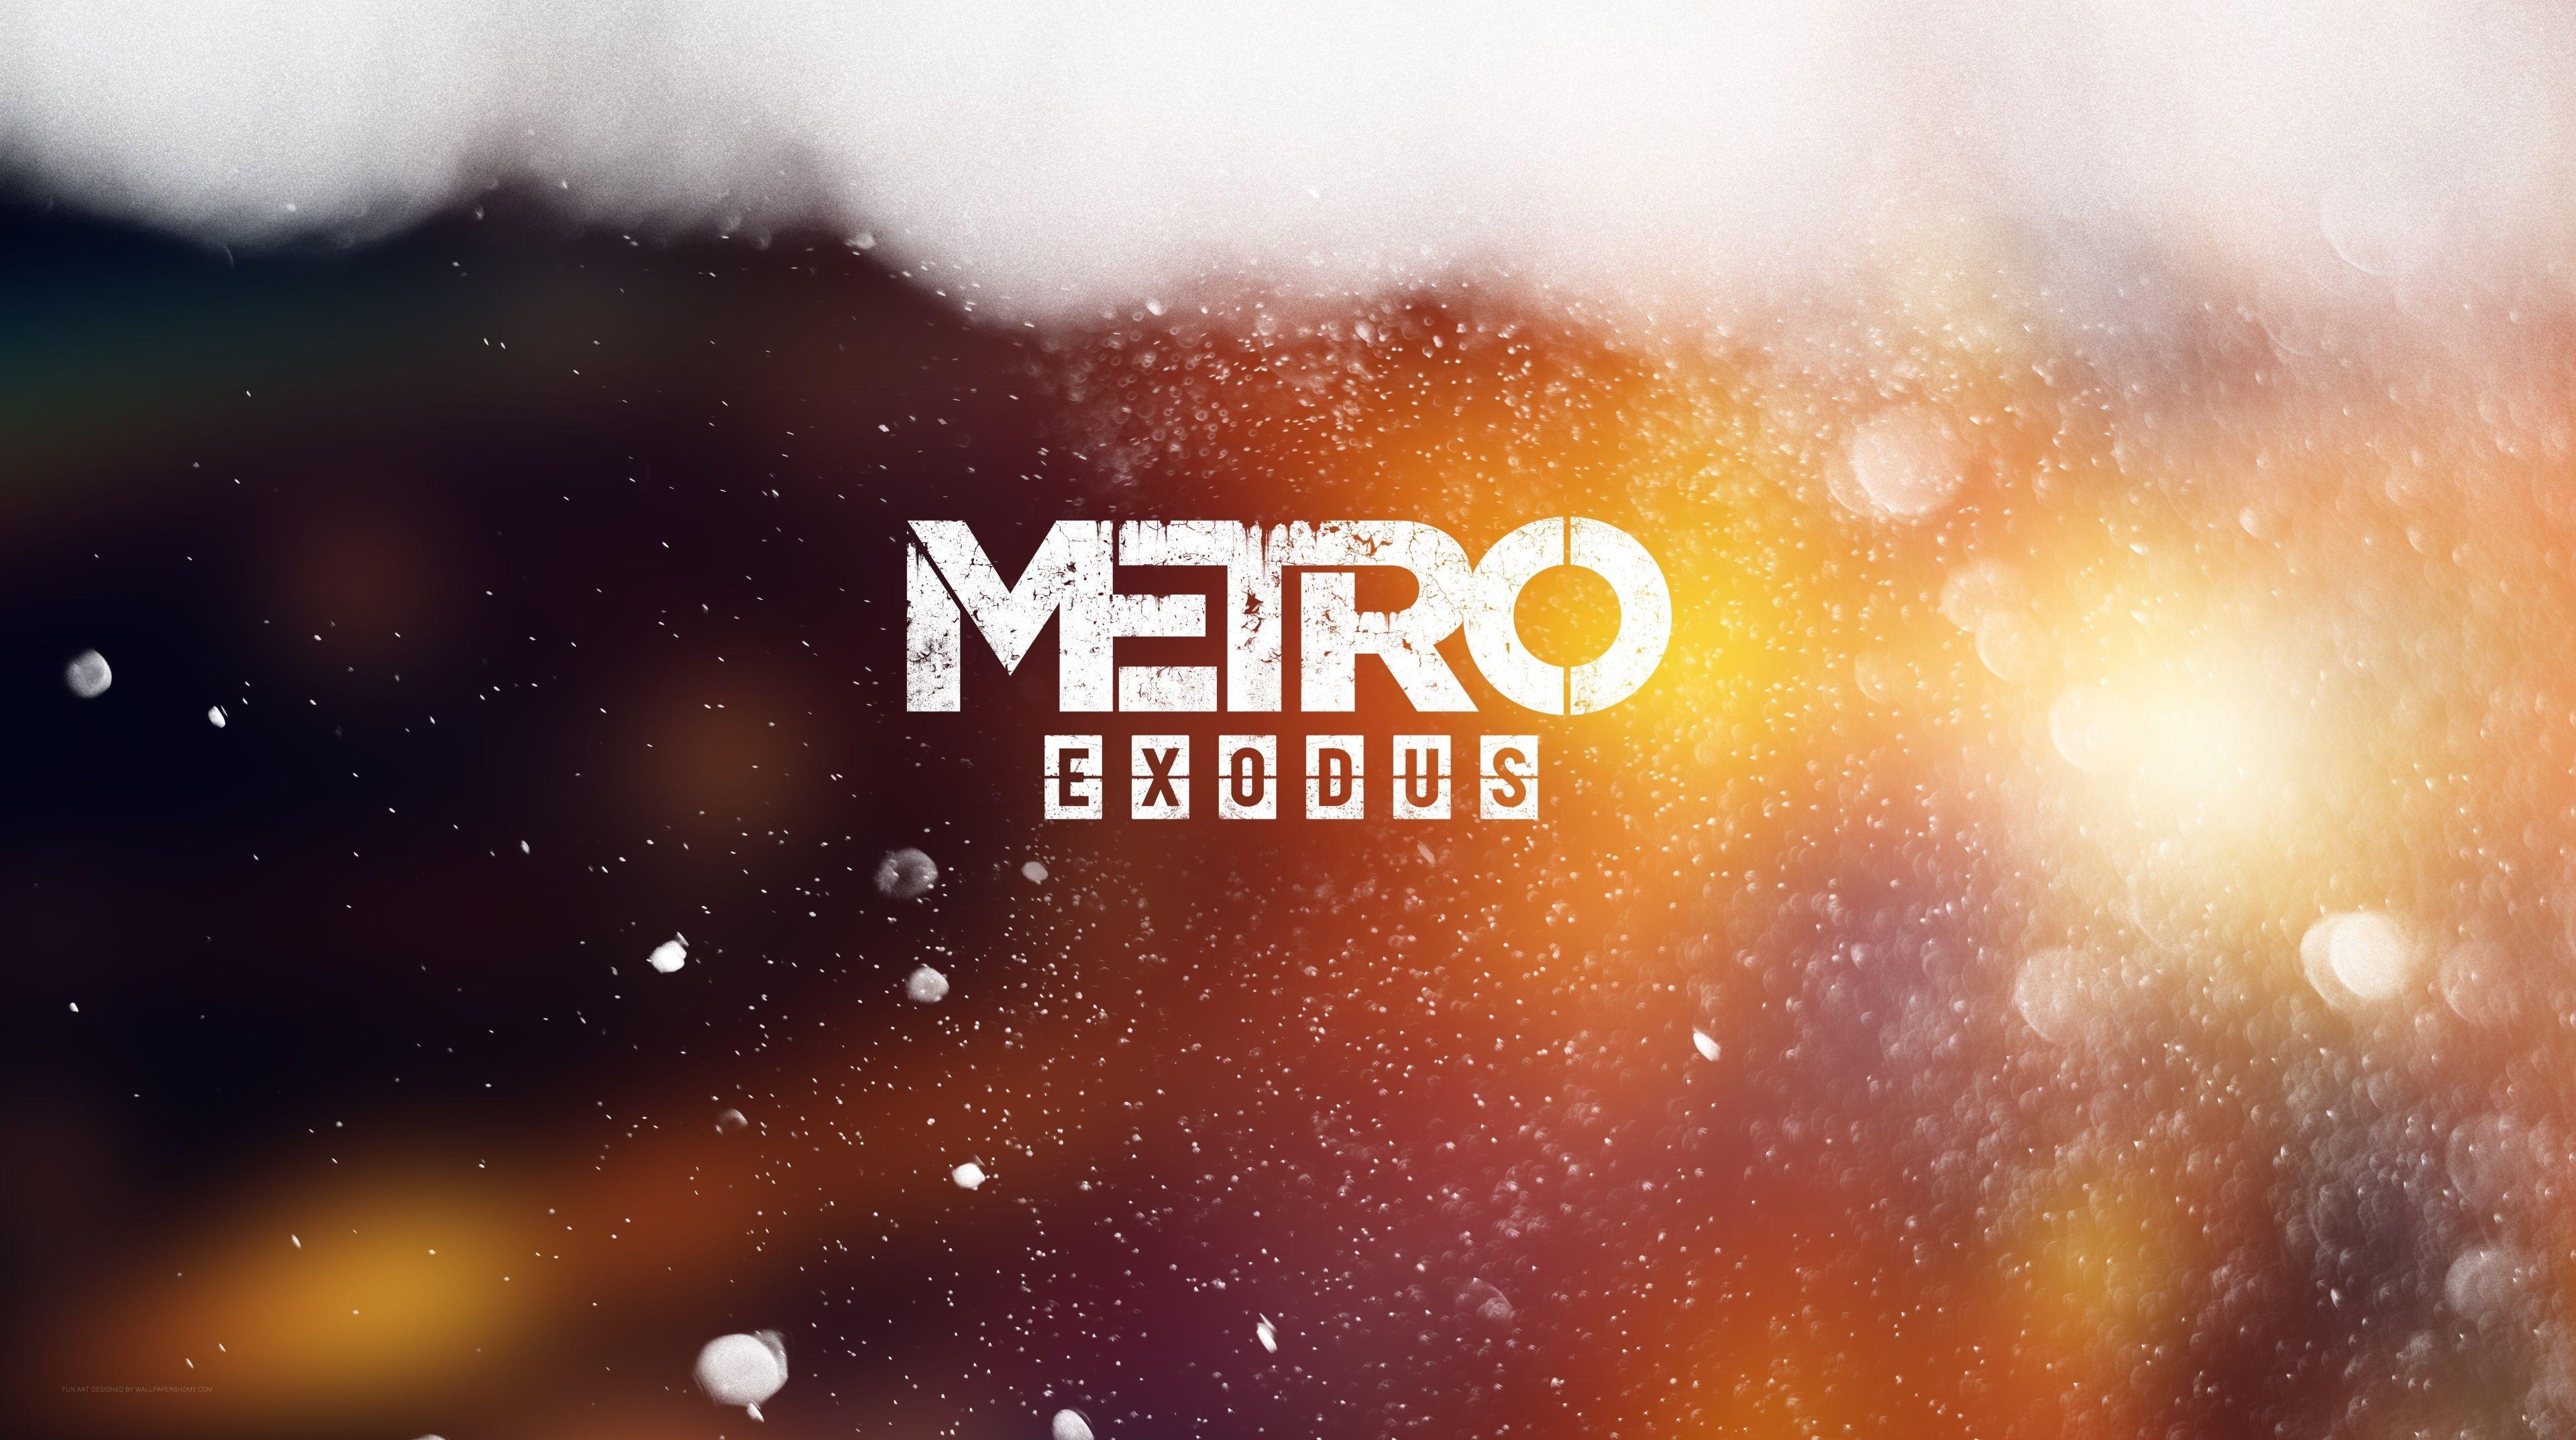 3840x2146 Metro Exodus 4k High Resolution Wallpaper For